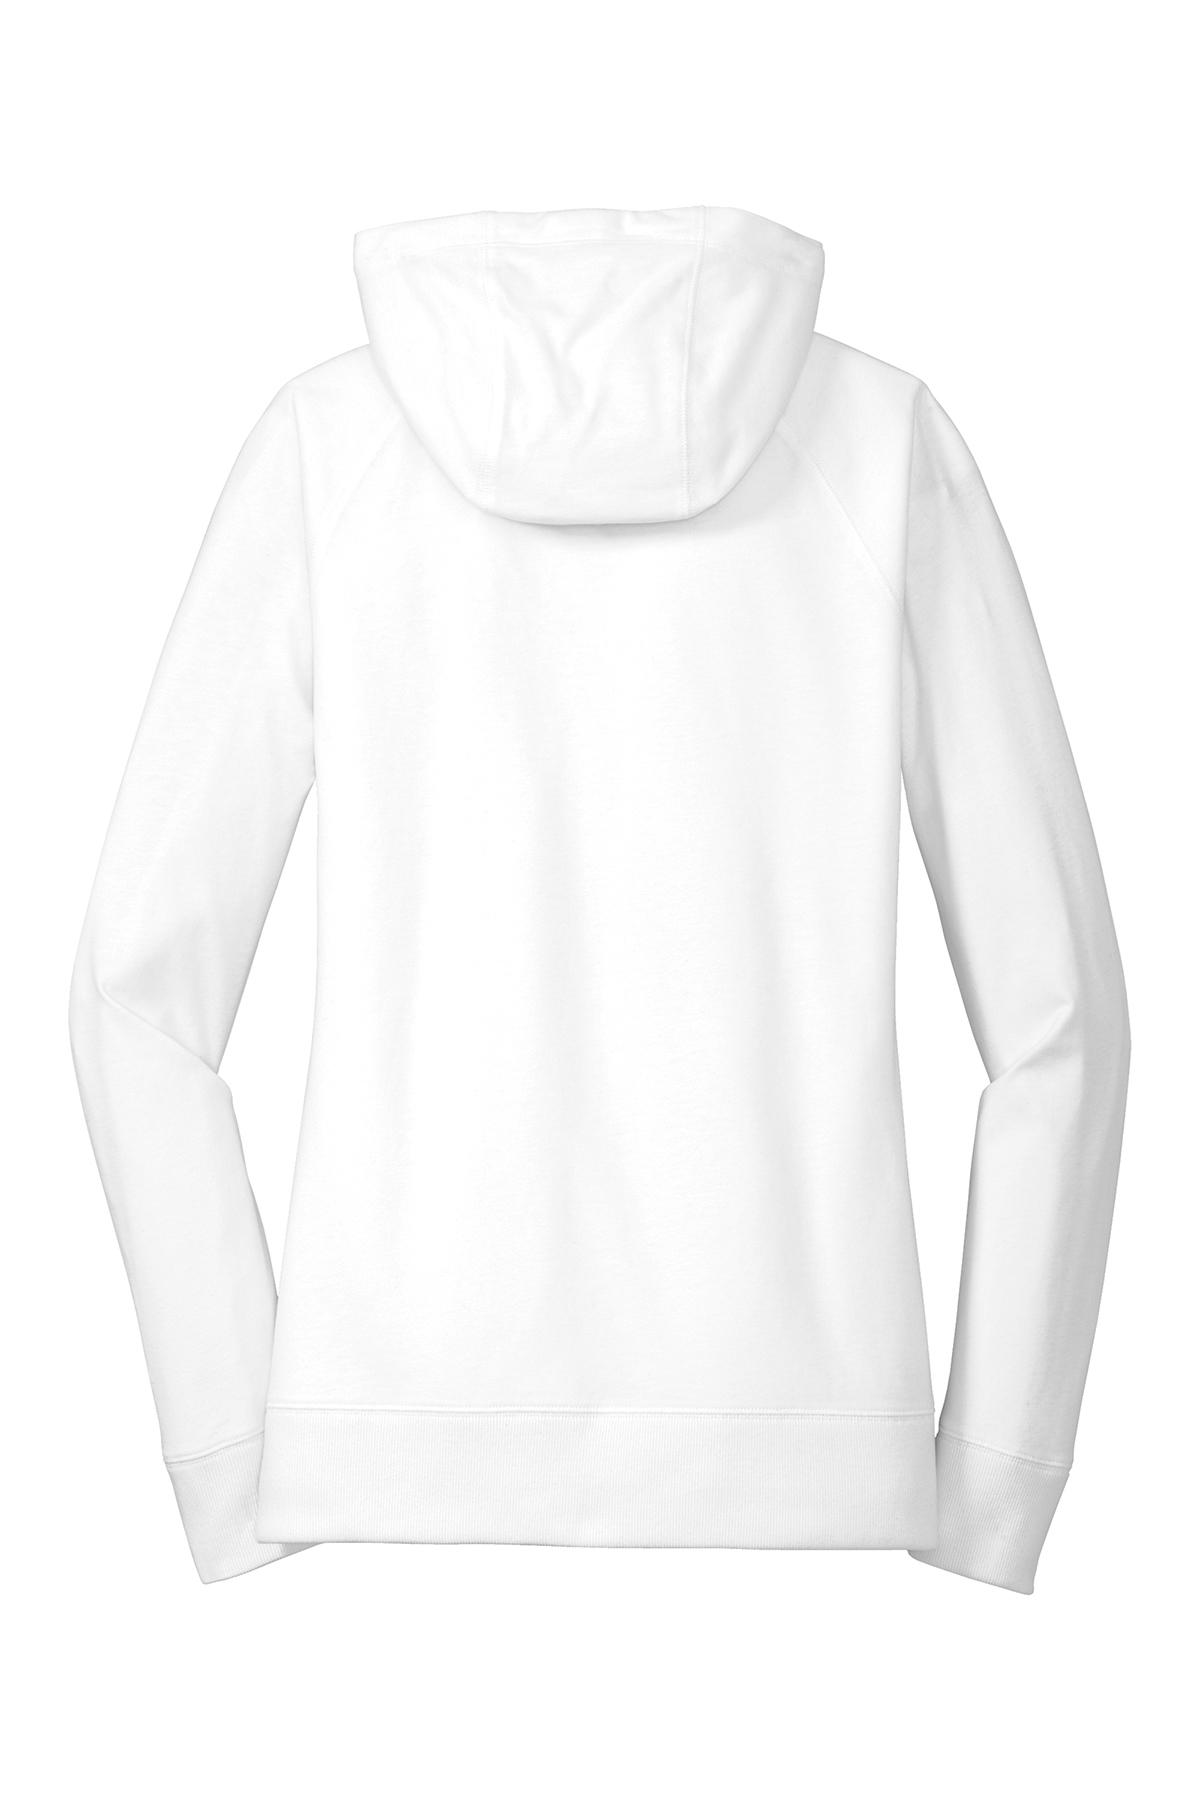 a9159ece01c New Era® Ladies Sueded Cotton Blend Full-Zip Hoodie